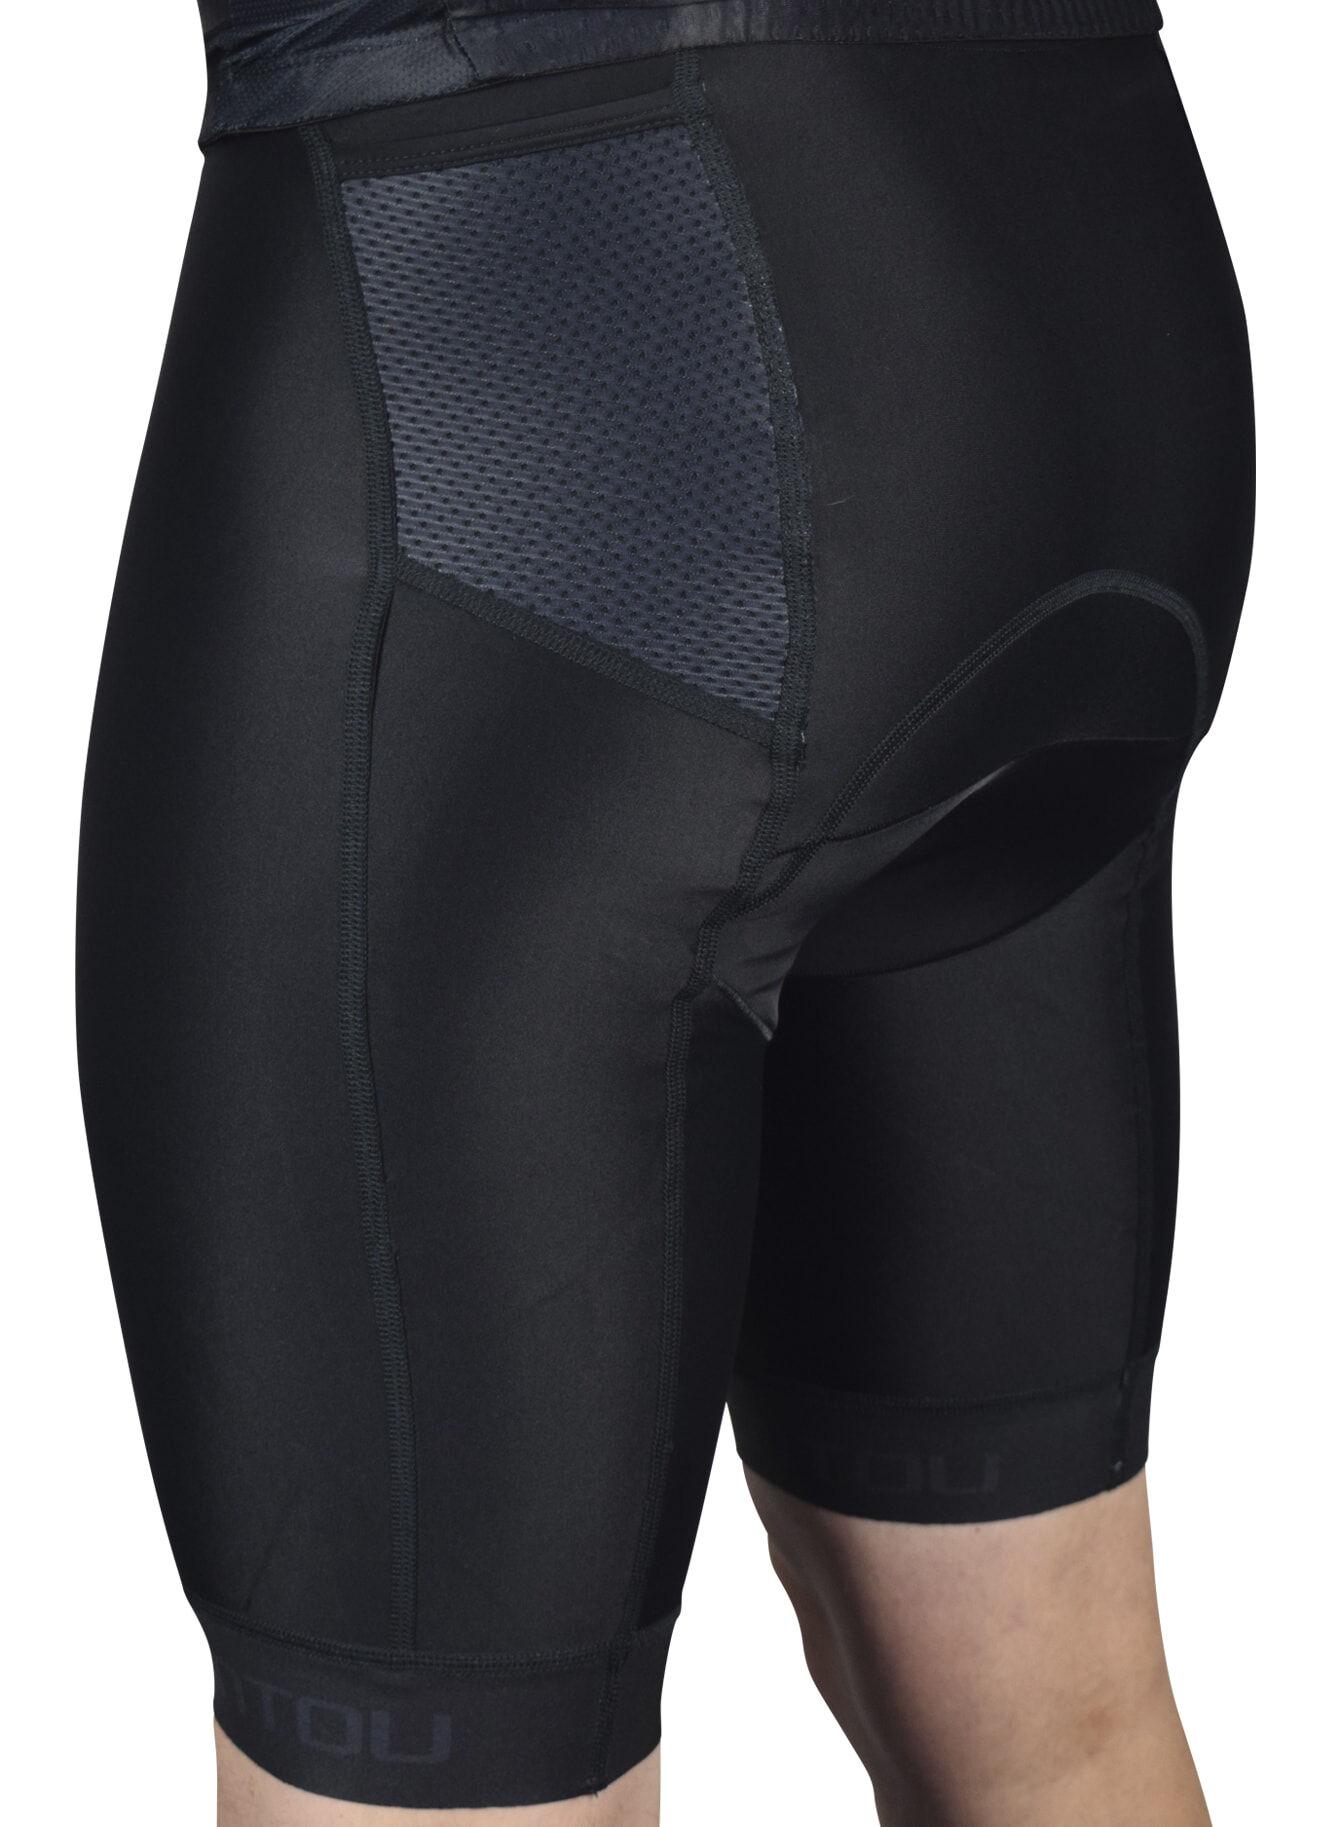 Black Tri Shorts Side